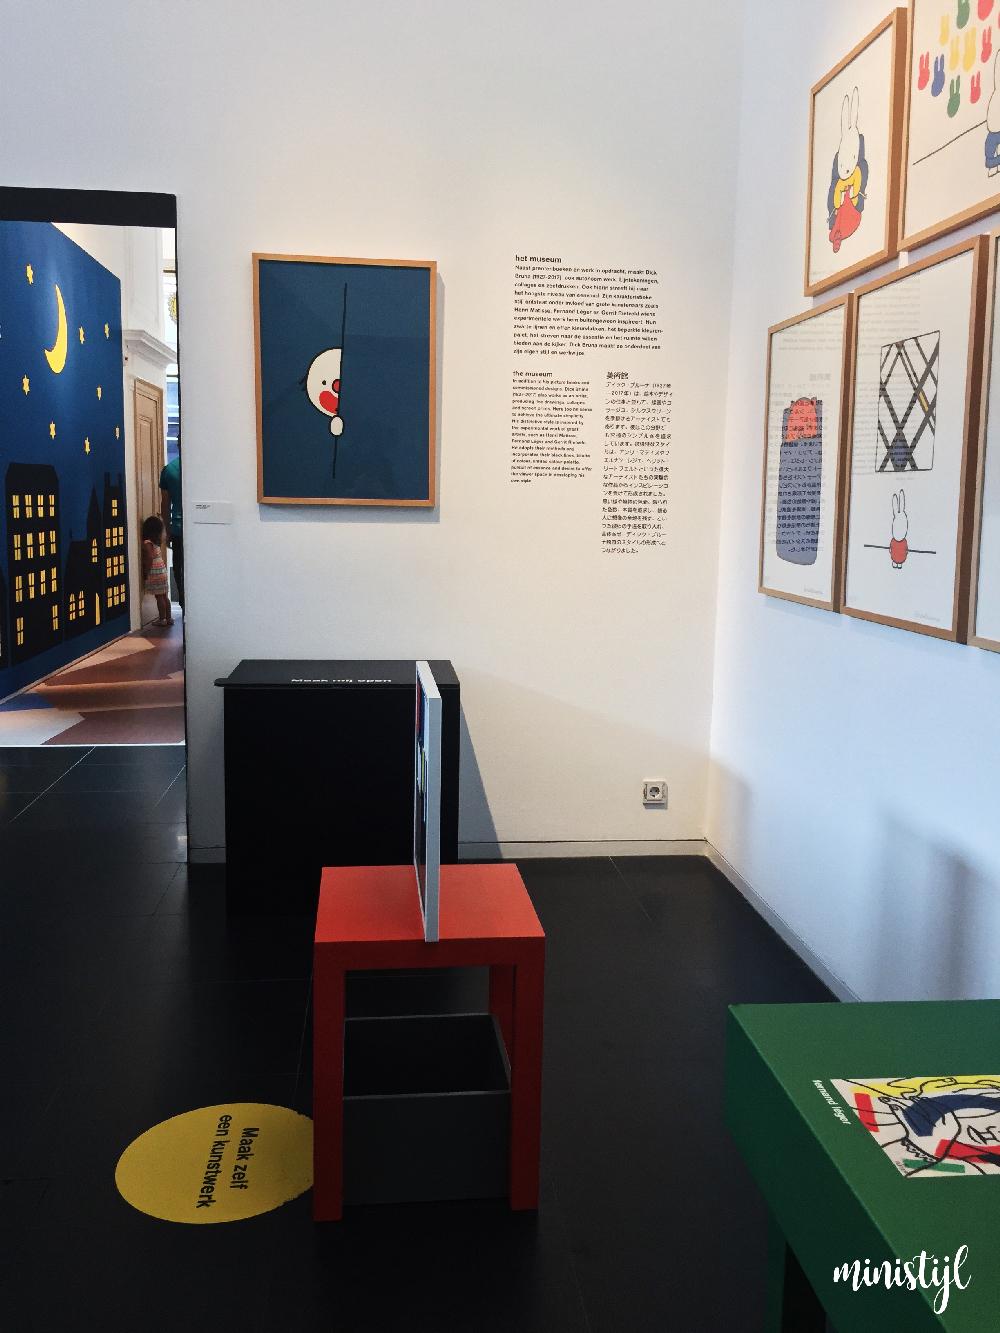 nijntje-museum-